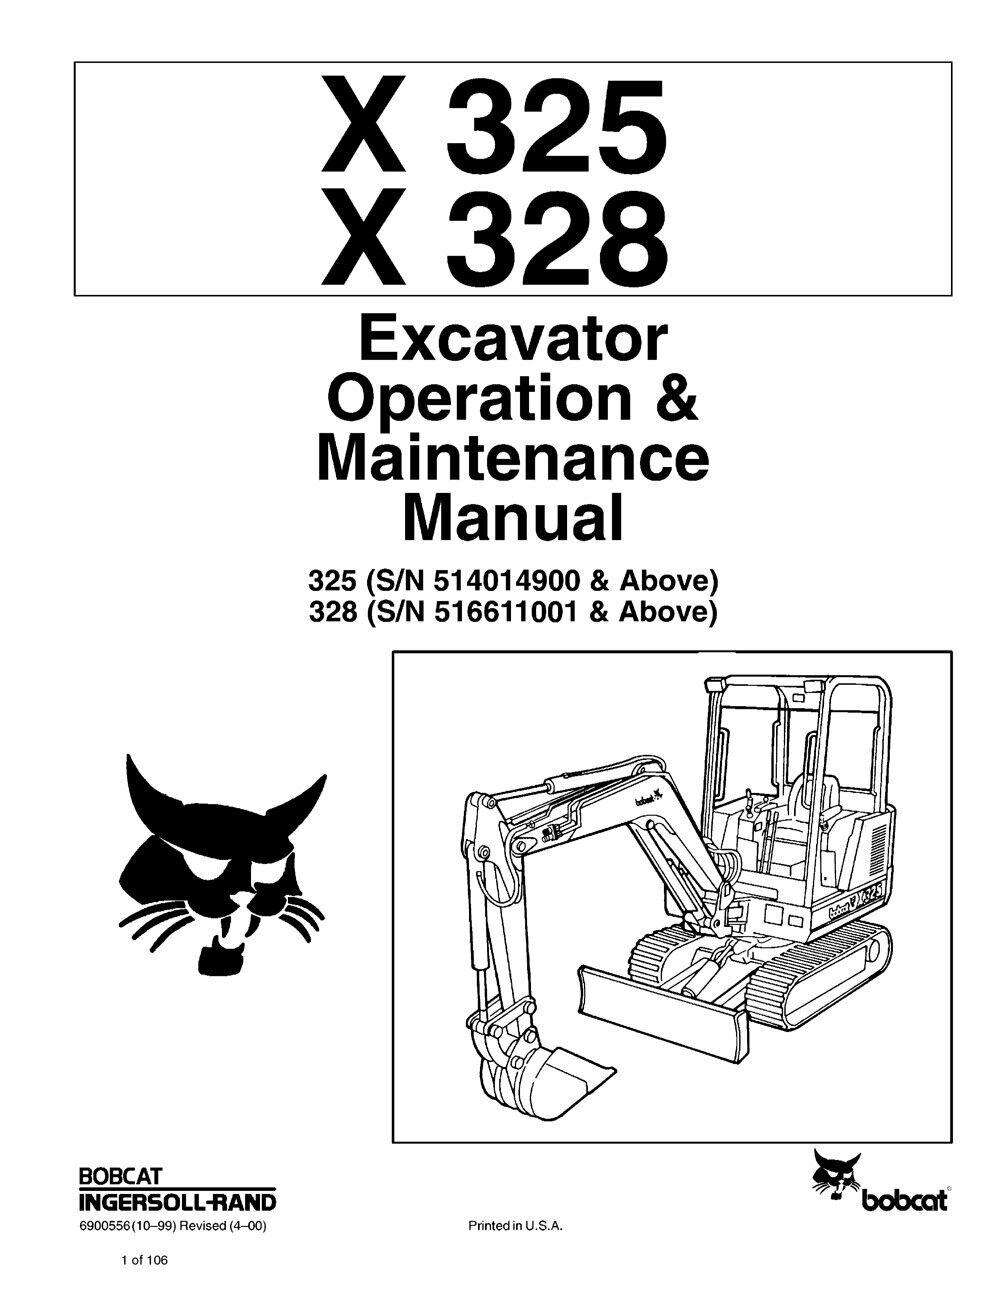 Bobcat X325x328 Excavator Operation Maintenance Manual S/n 514014900 &  Above | eBay